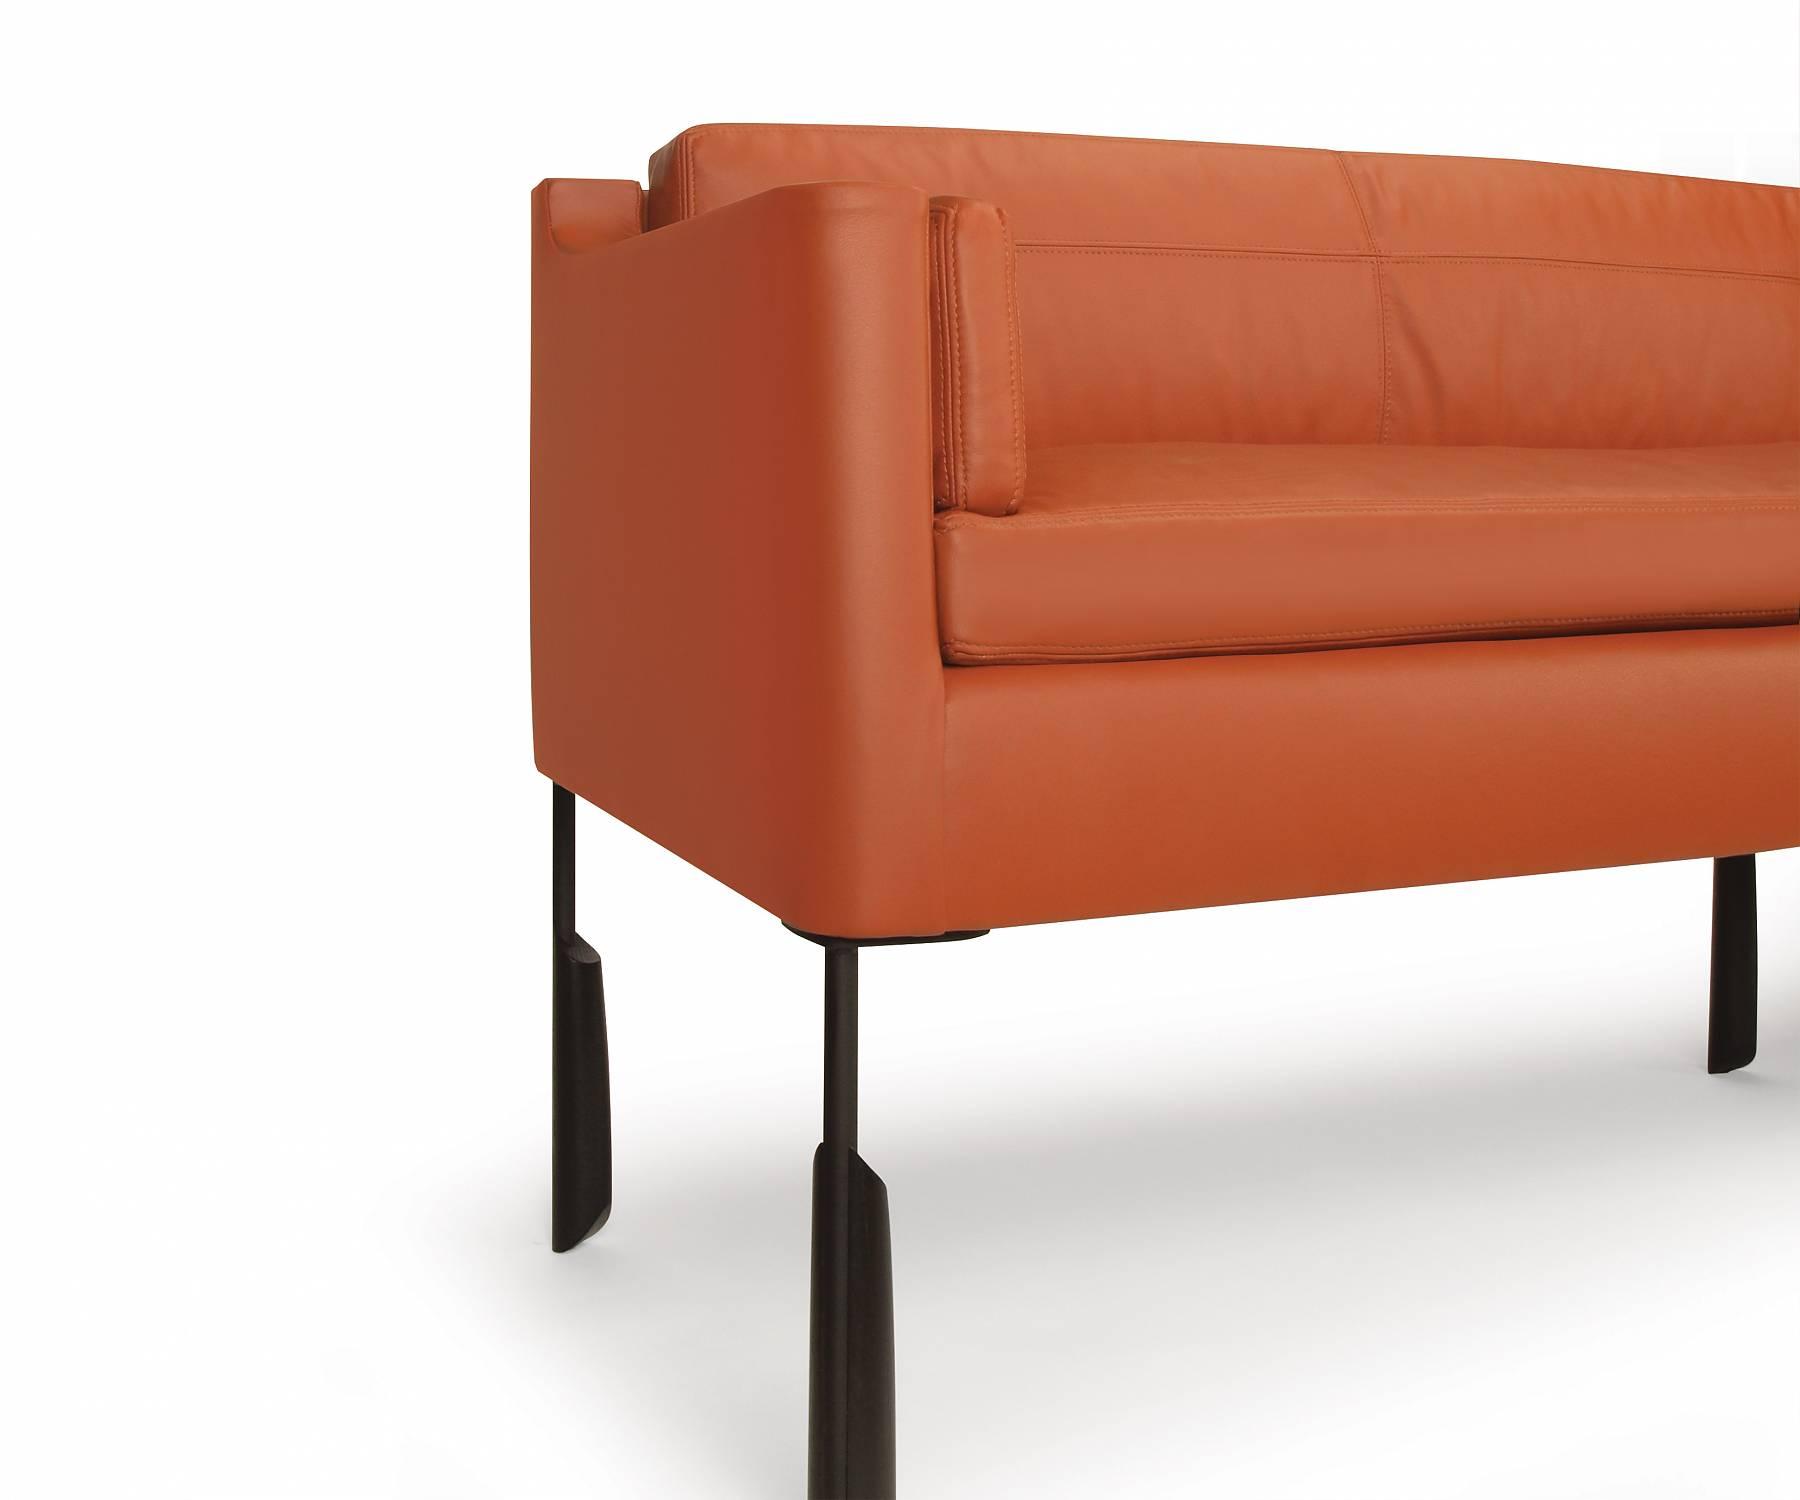 Altai Sofa by Skram Furniture